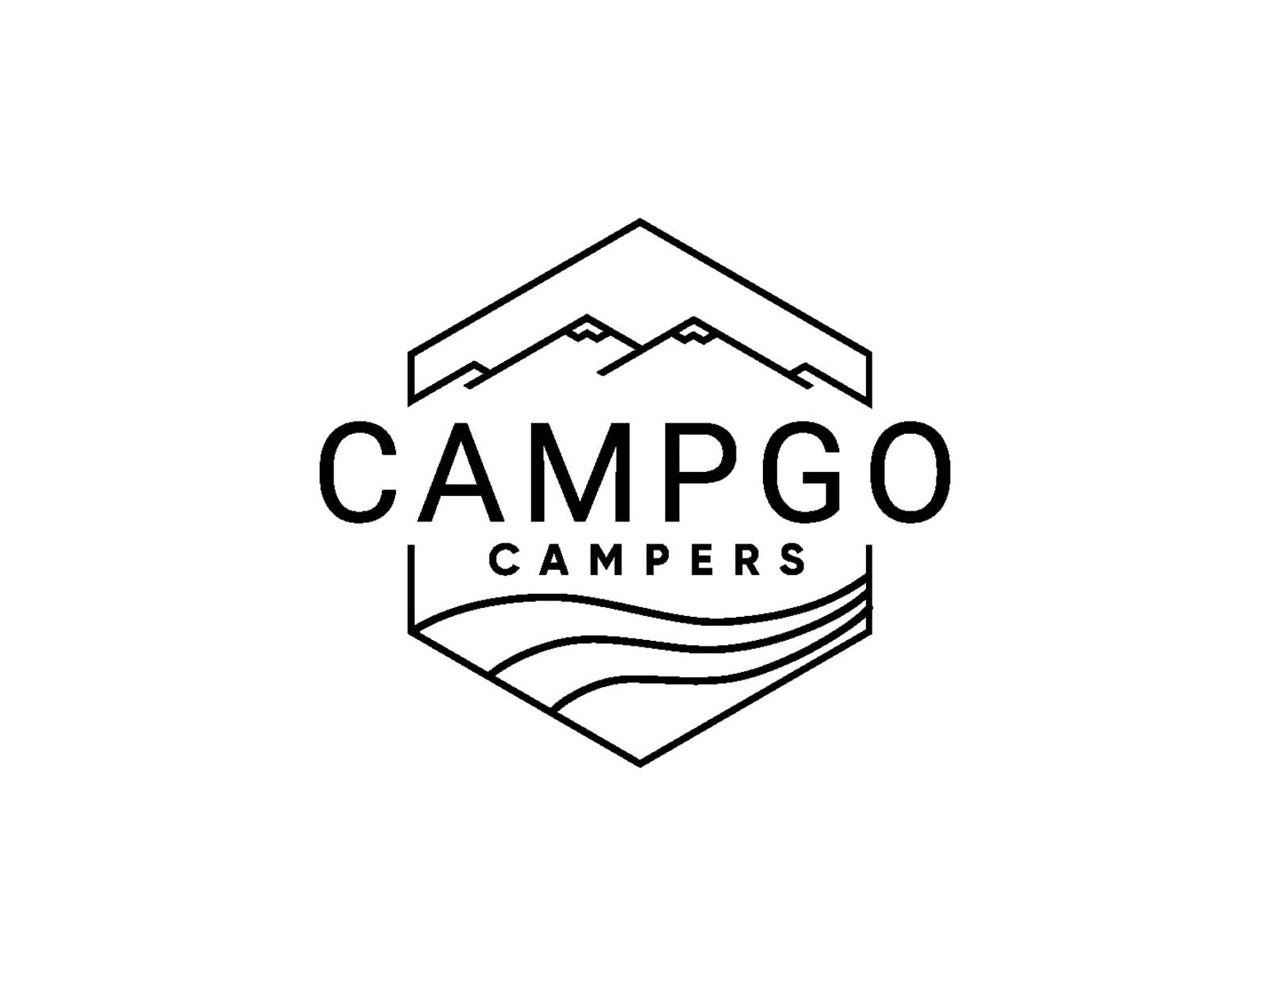 CAMPGO.HR